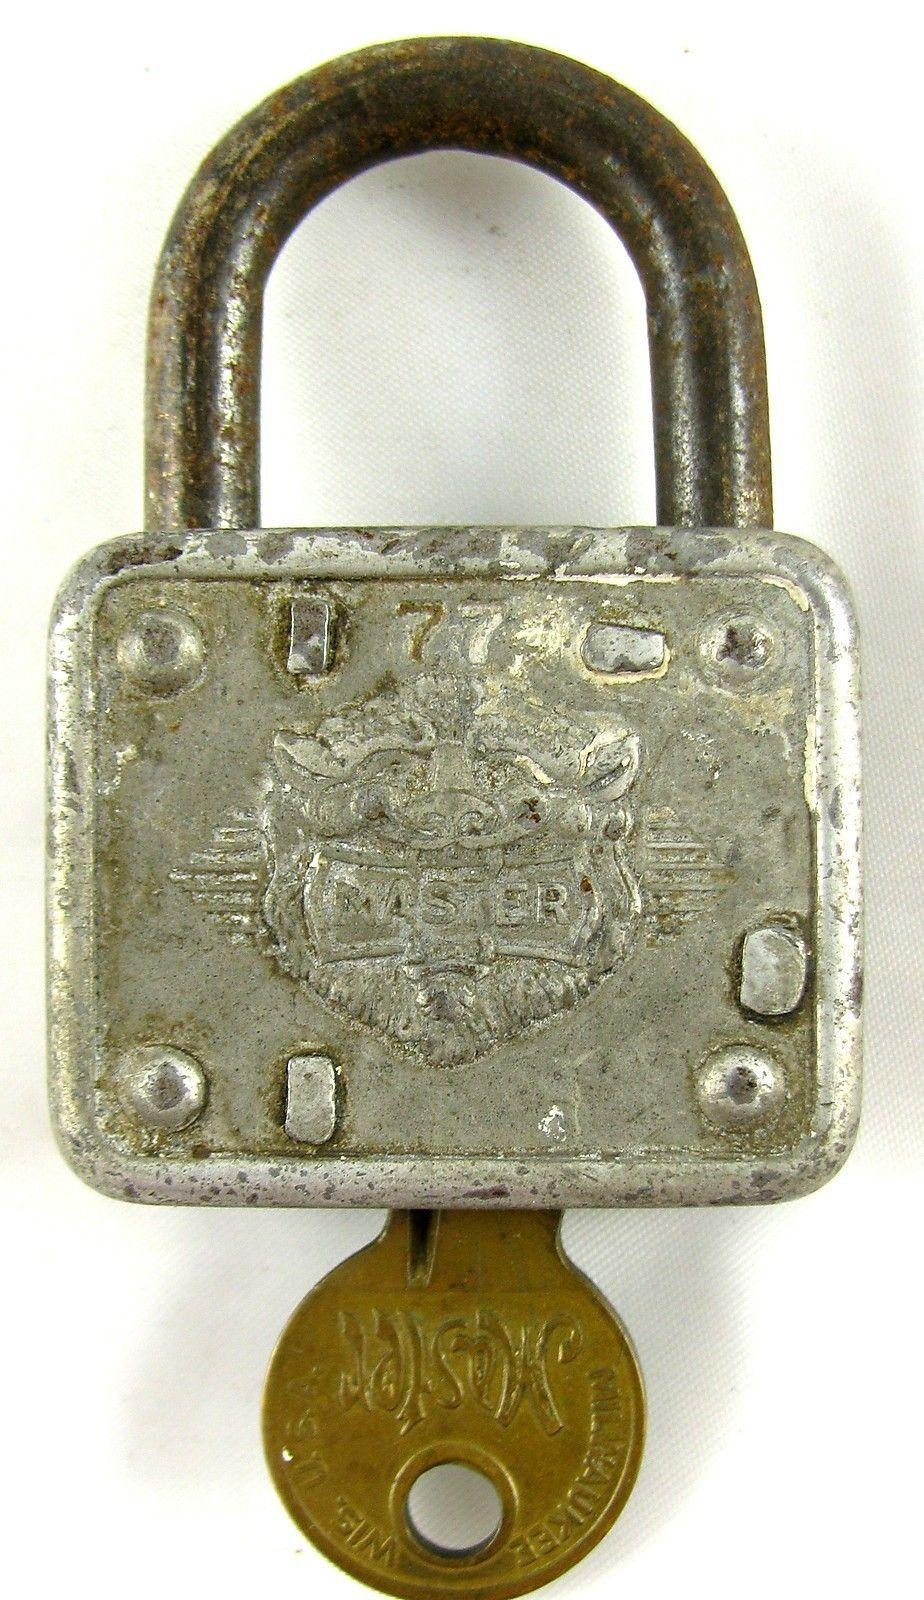 Master Lock Co Vintage Padlock 77 American Milwaukee Wi With Key